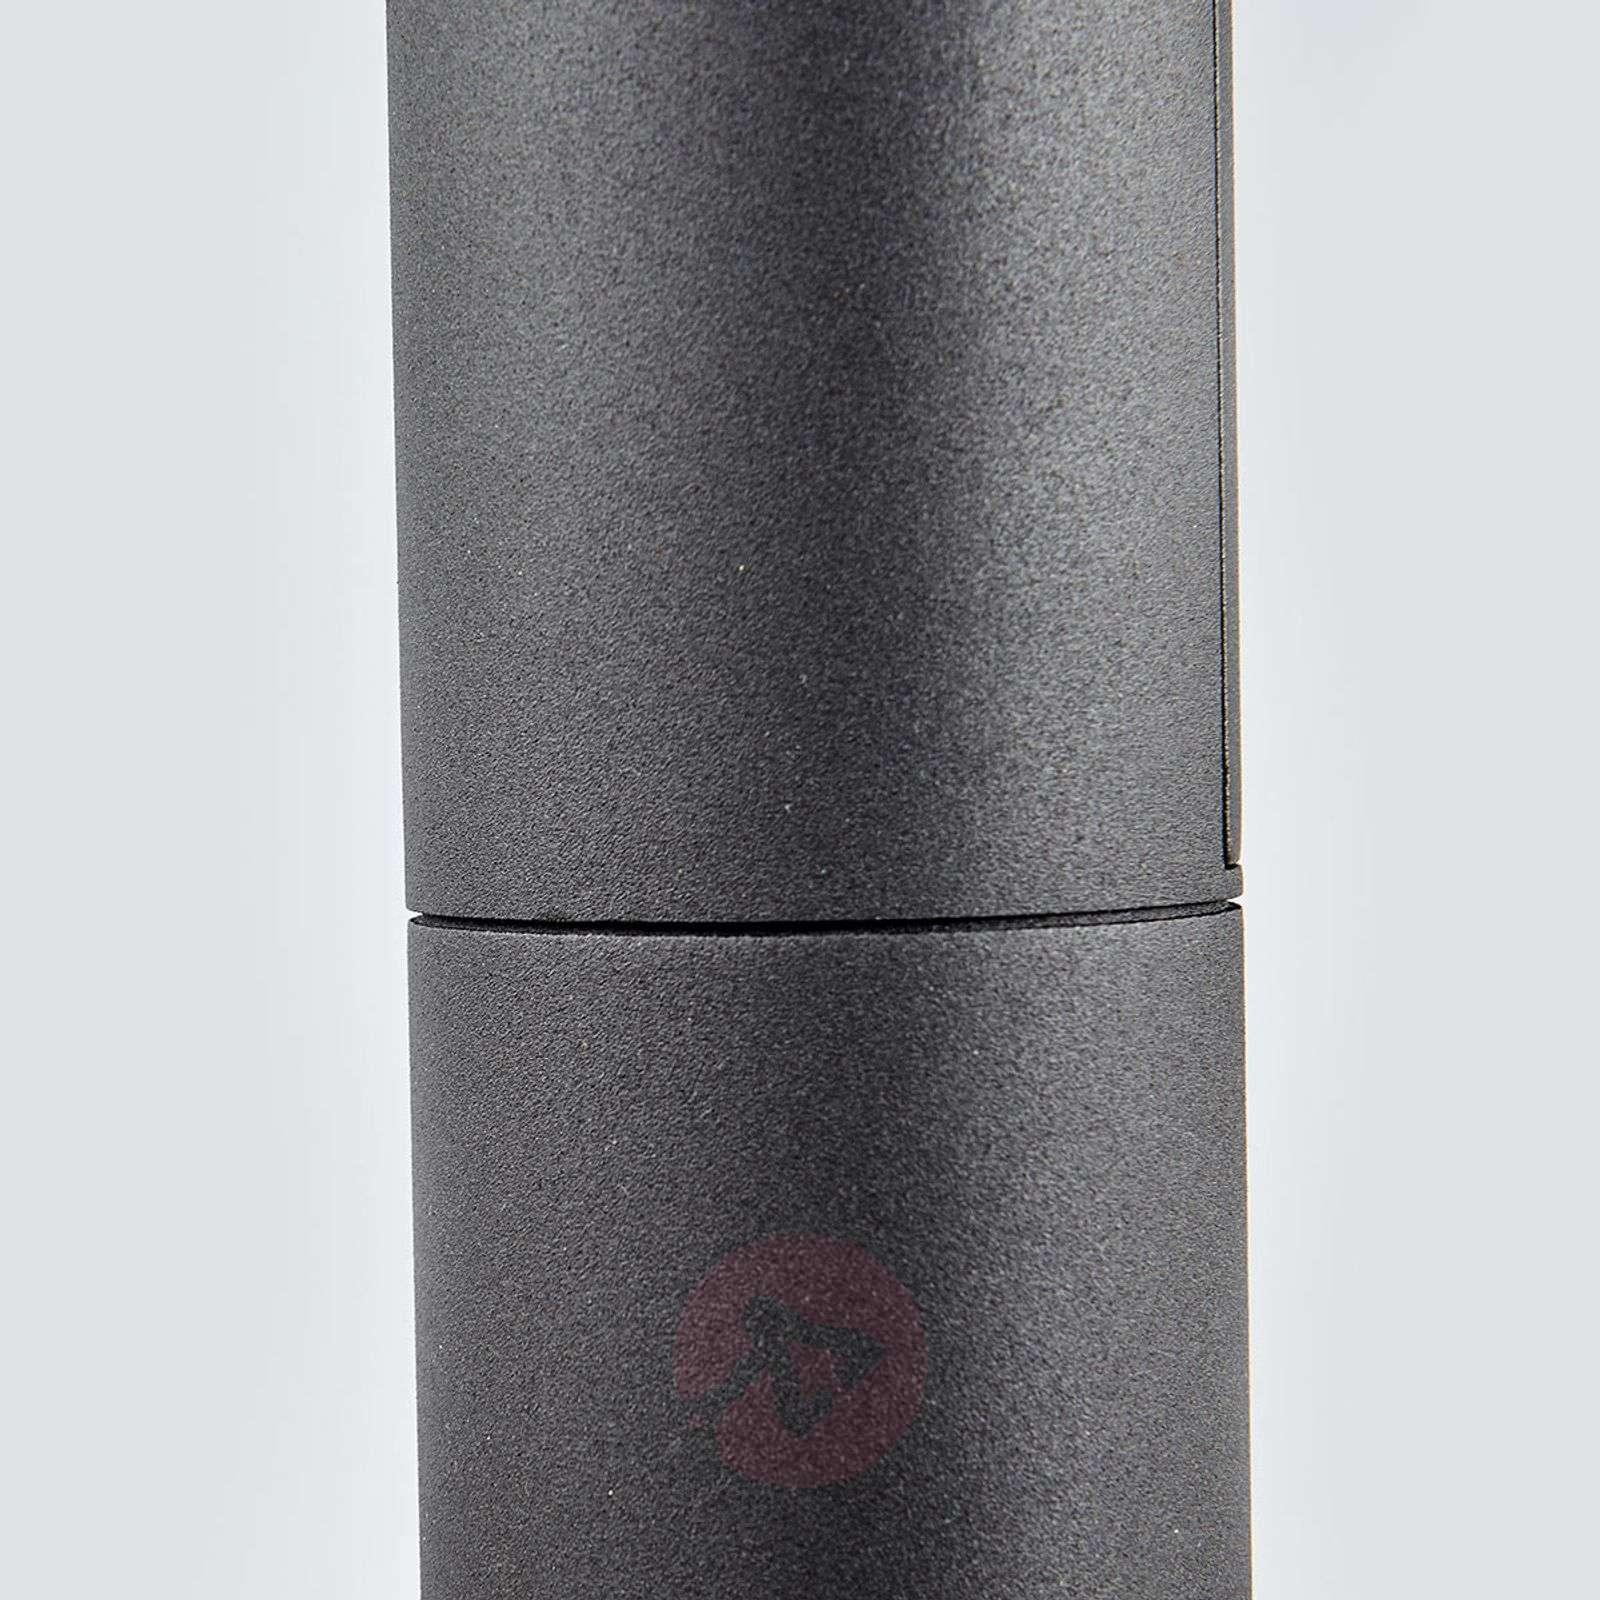 Tummanharmaa LED-pollarilamppu Olesia-9619138-02